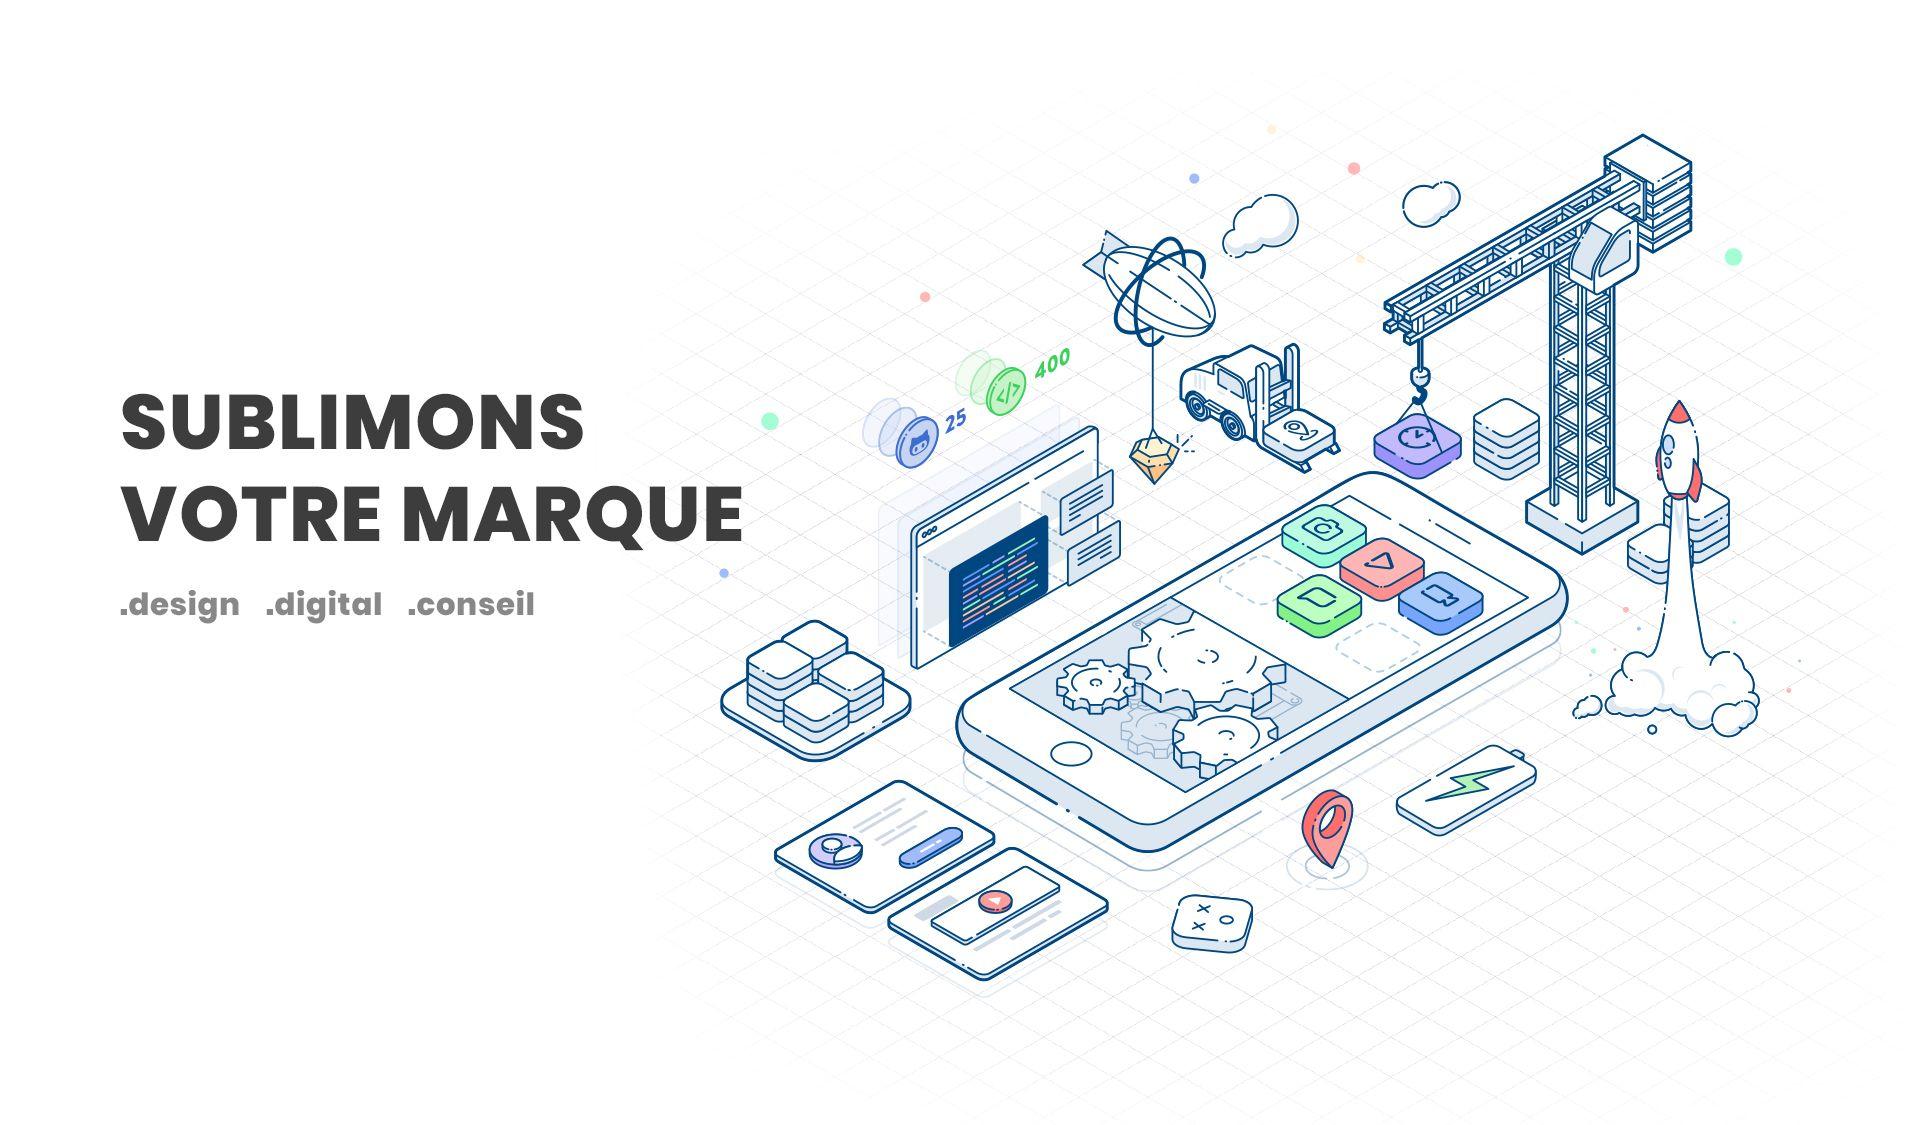 Graphiste / Digital / Conseil